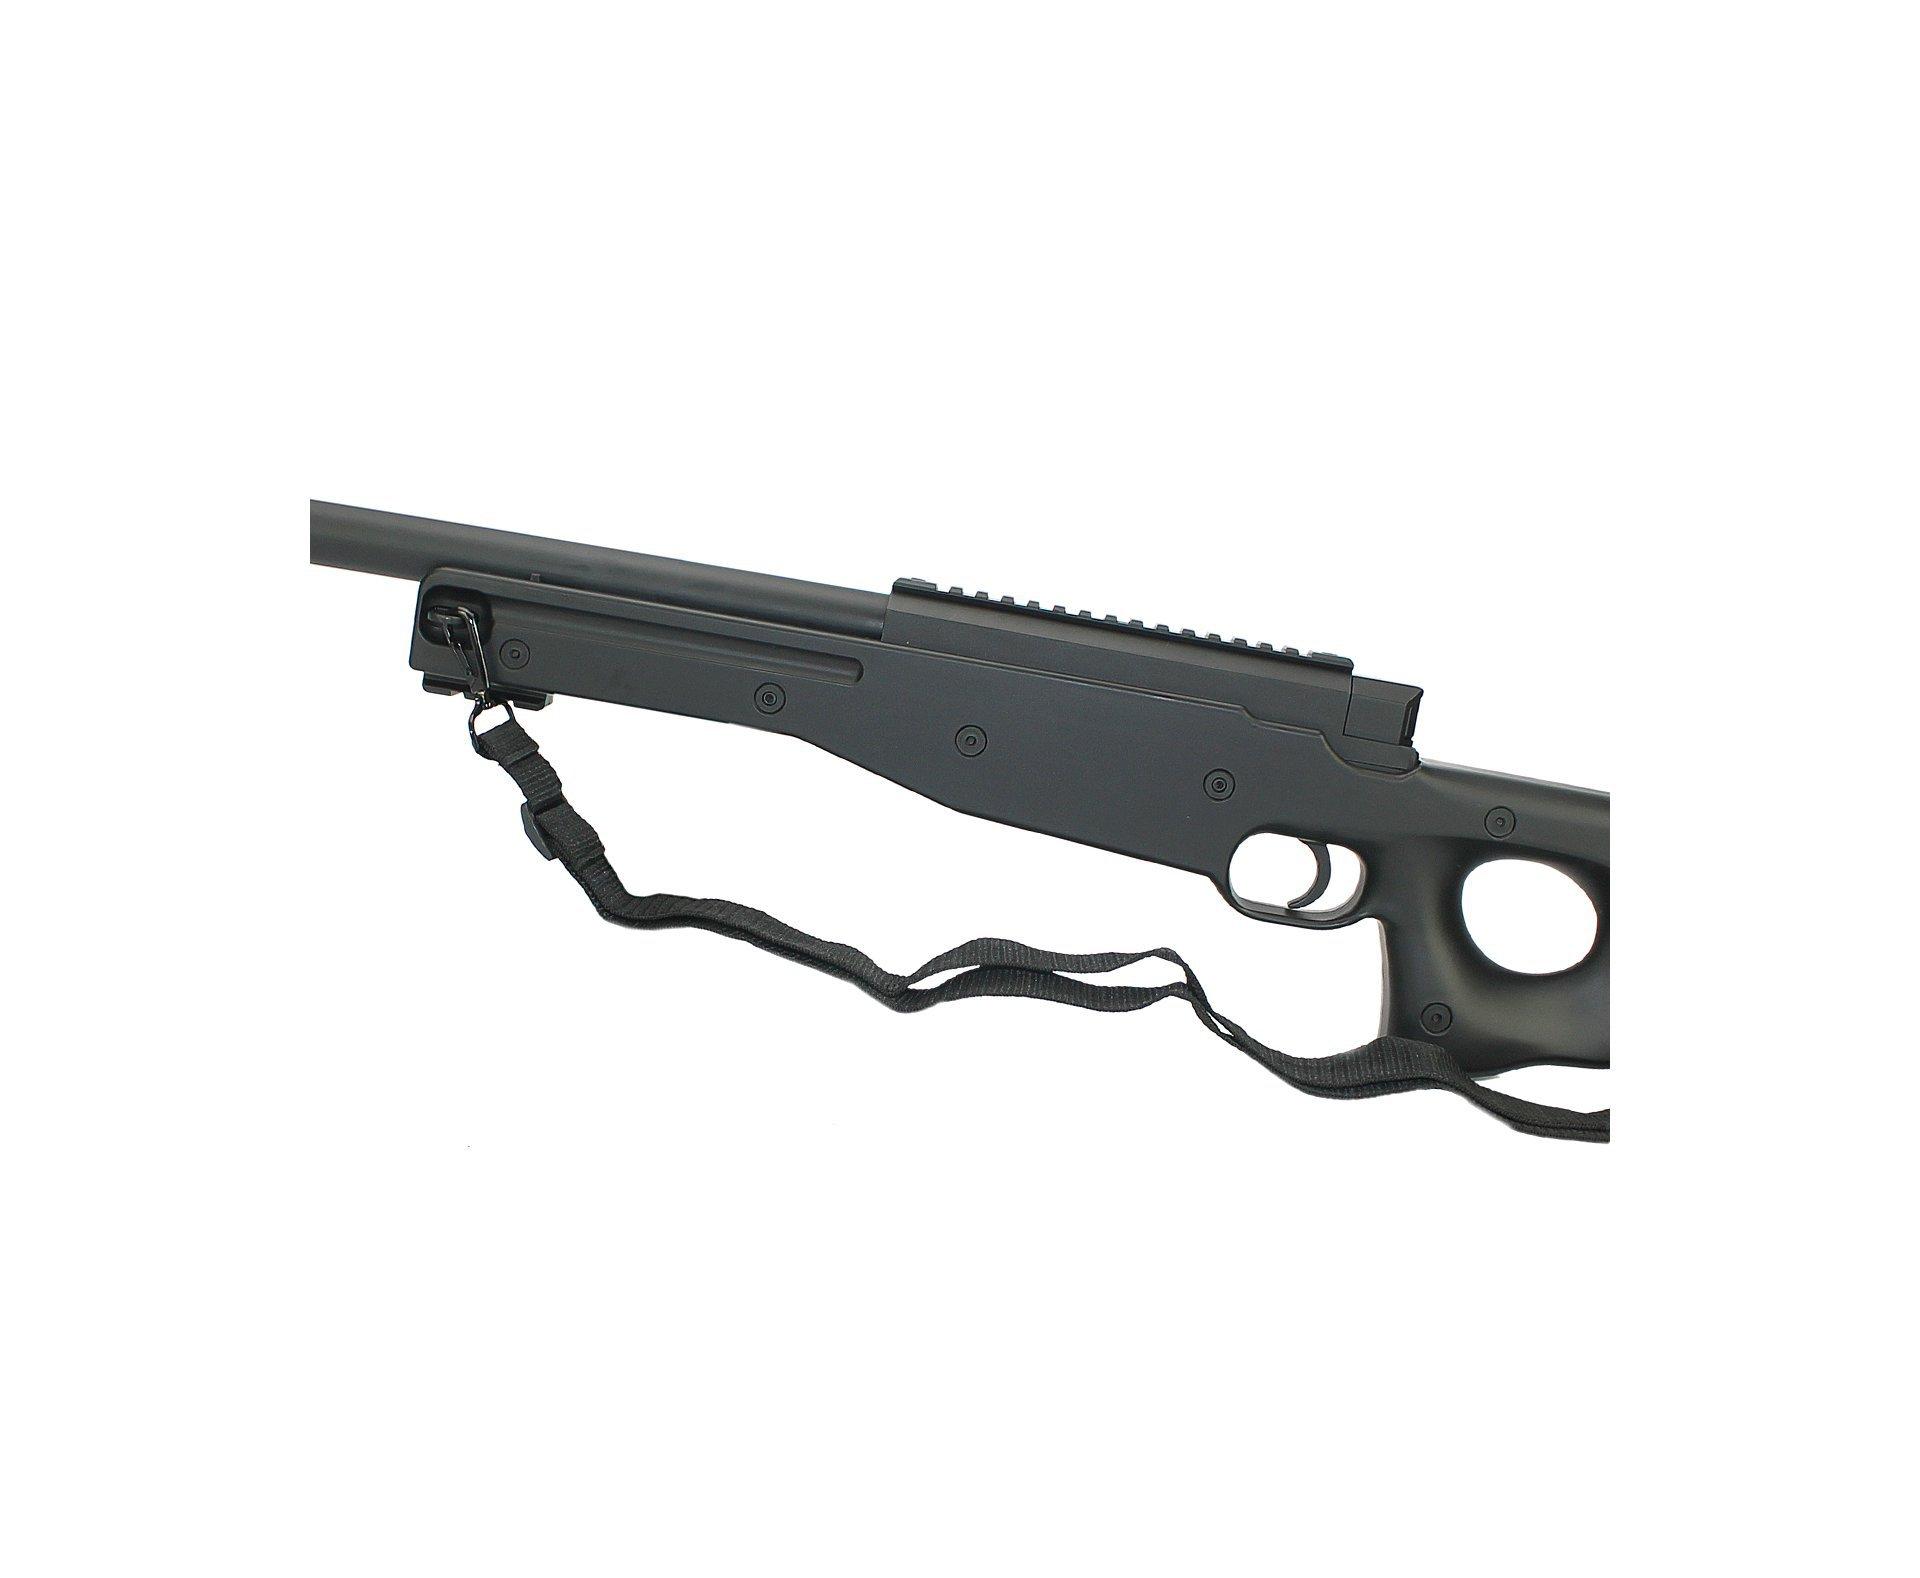 Rifle De Airsoft Sniper Spring L96 6mm M59a - Double Eagle